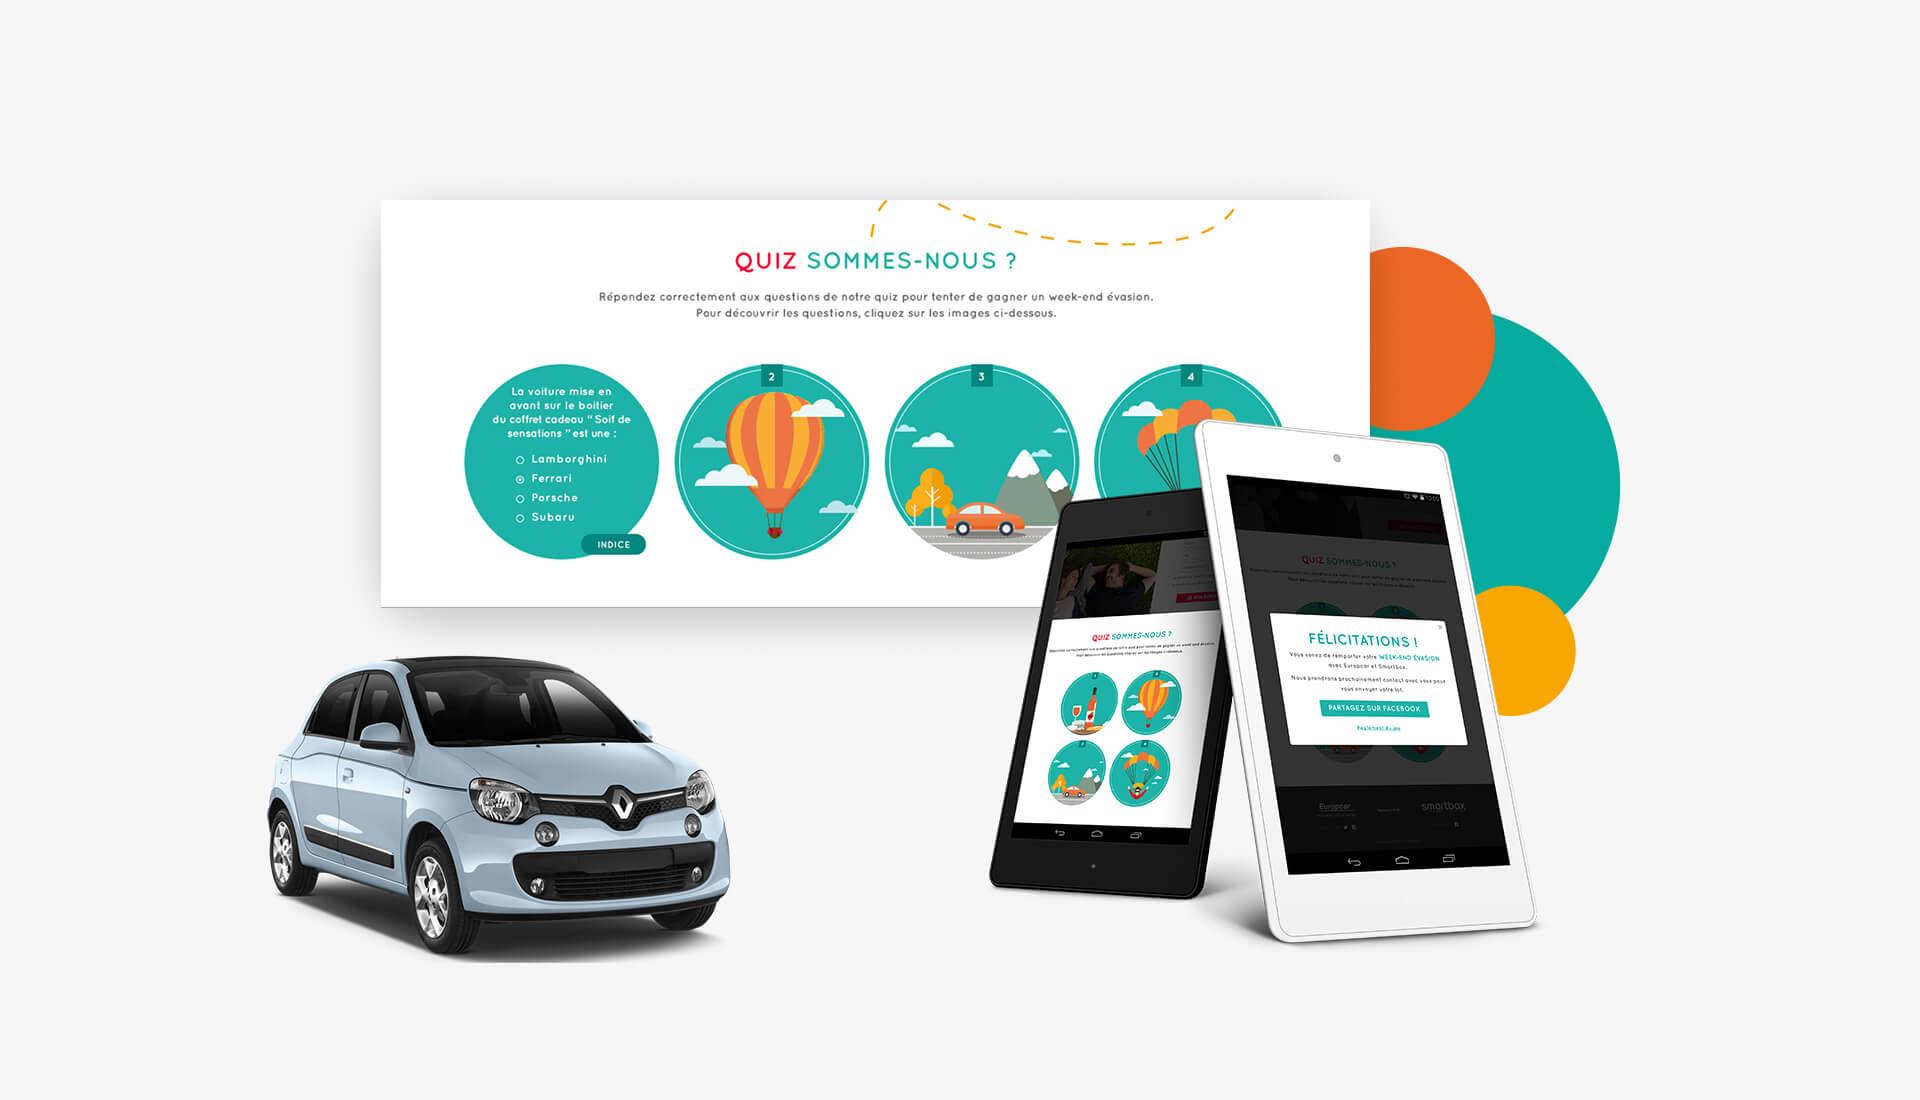 Agence Sharing - Jeu Concours sur Europcar Smartbox